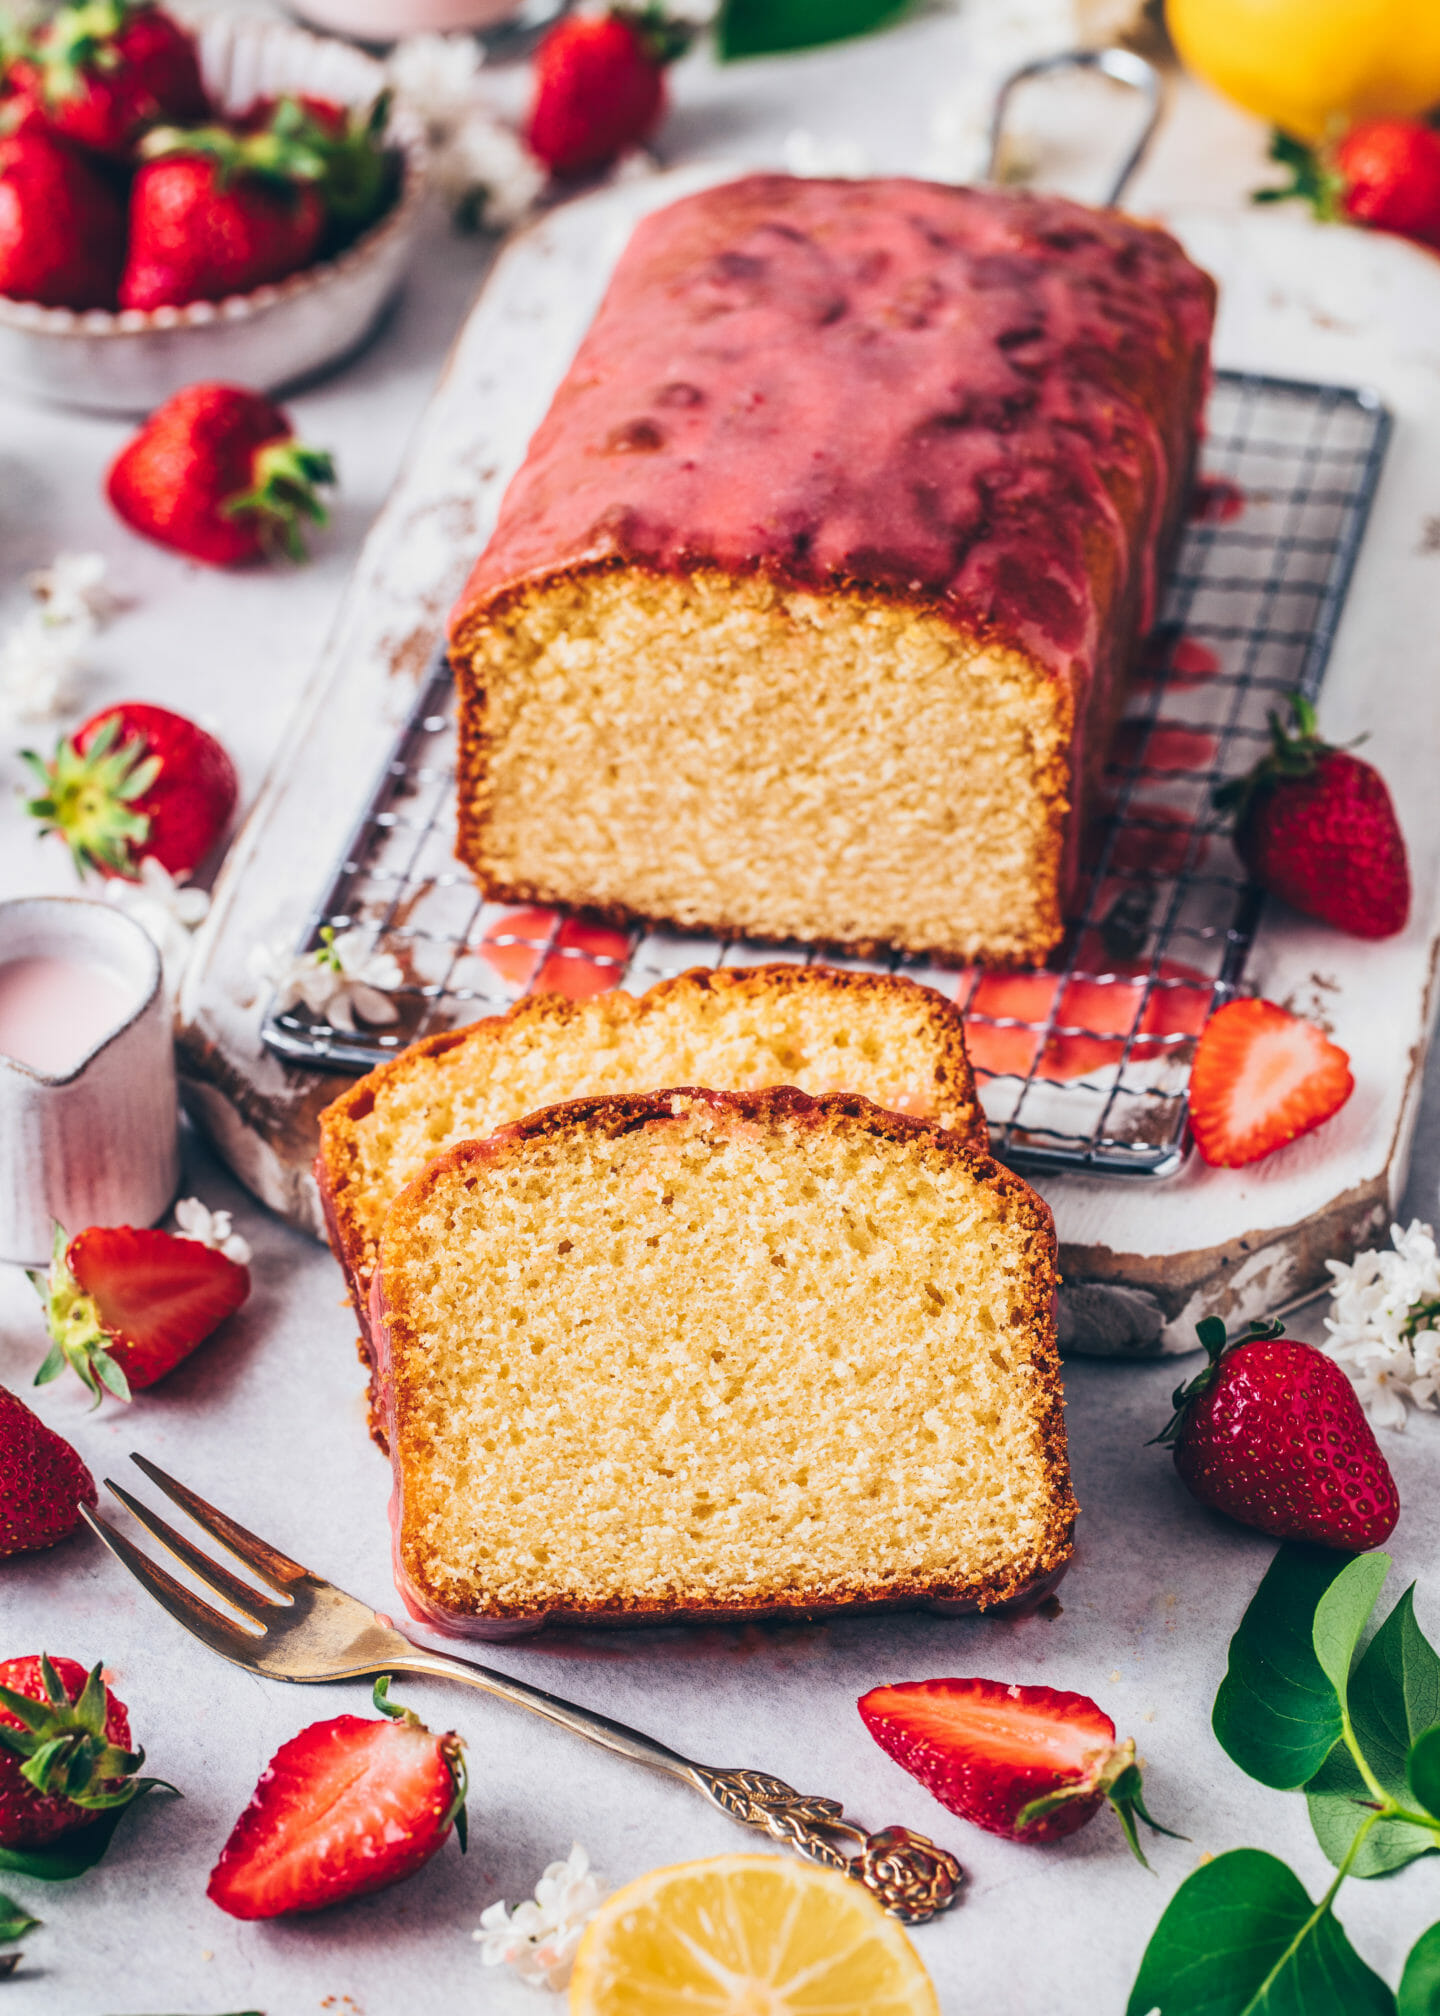 Veganer Zitronenkuchen mit Erdbeer-Glasur